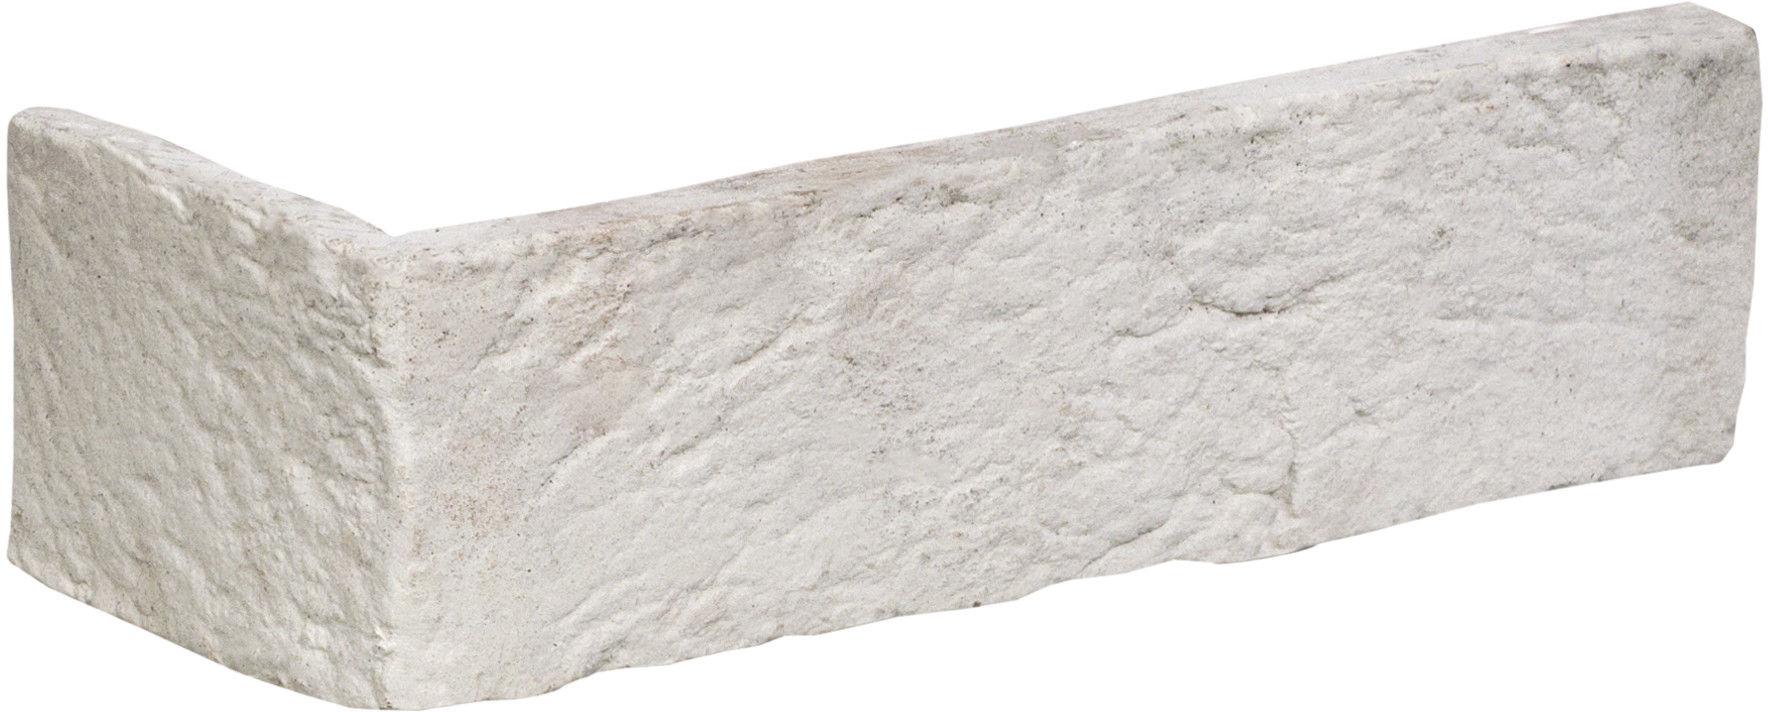 Cegła Retro Vanilia 19x6,5